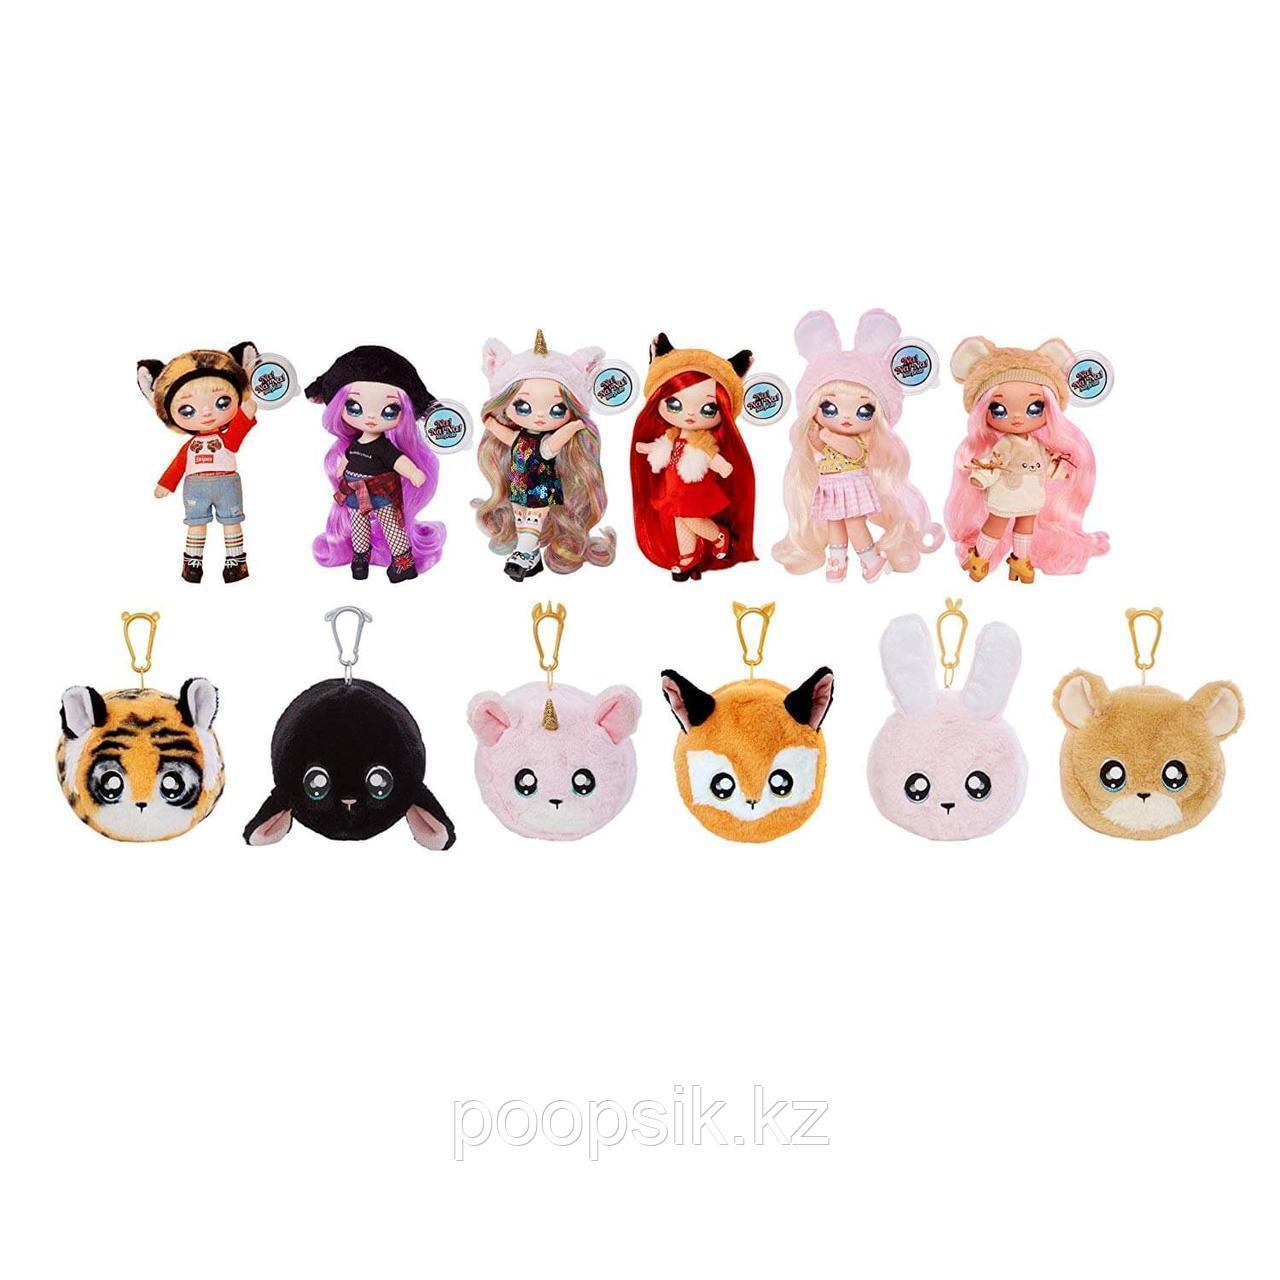 Na! Na! Na! Surprise - Мягкая куколка Roxie Foxy с животным-помпоном-сумочкой Лисичкой - фото 2